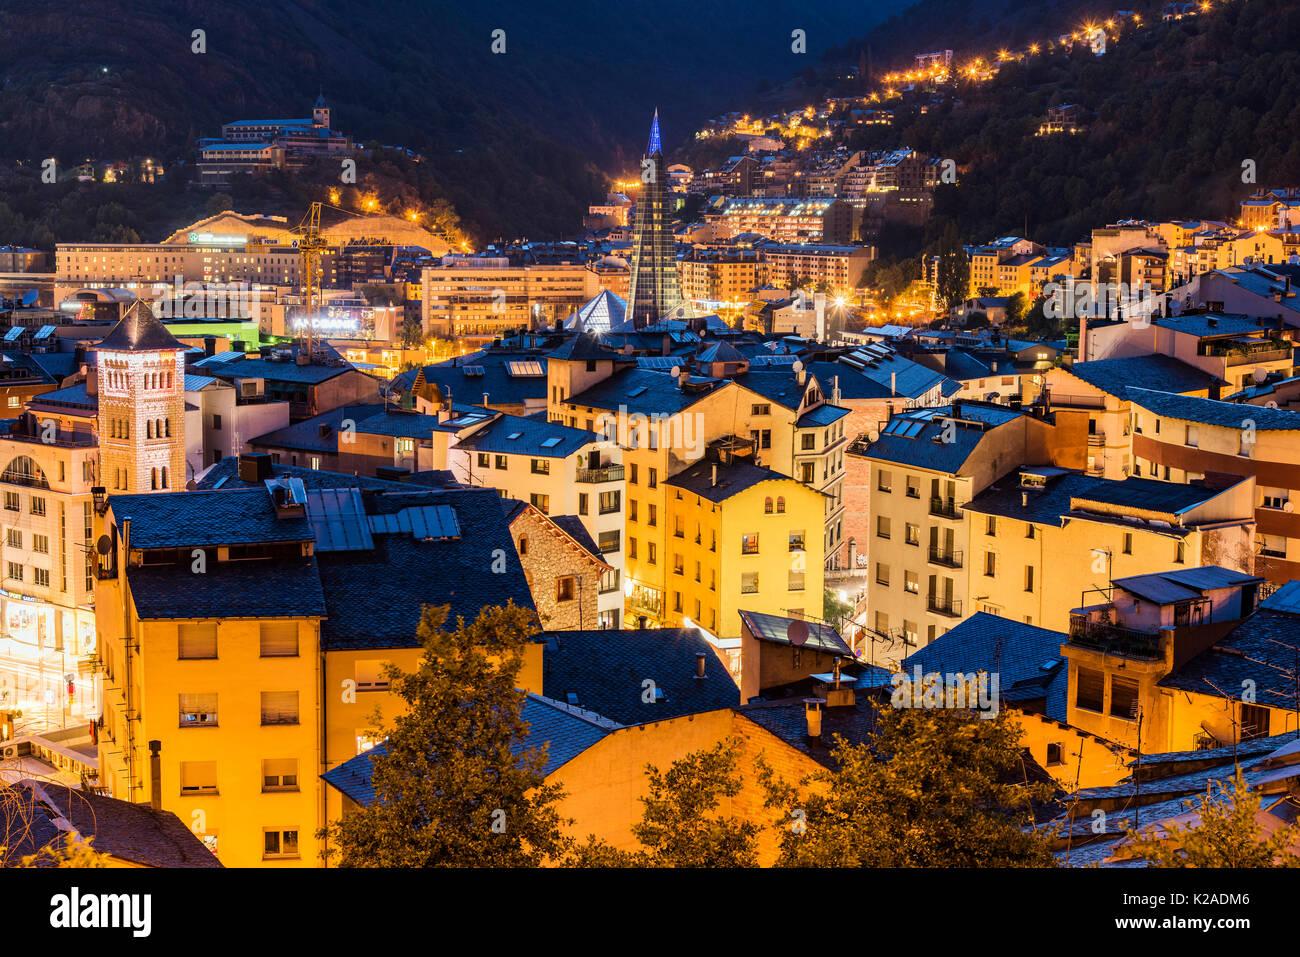 City Skyline bei Nacht, Andorra la Vella, Andorra Stockbild